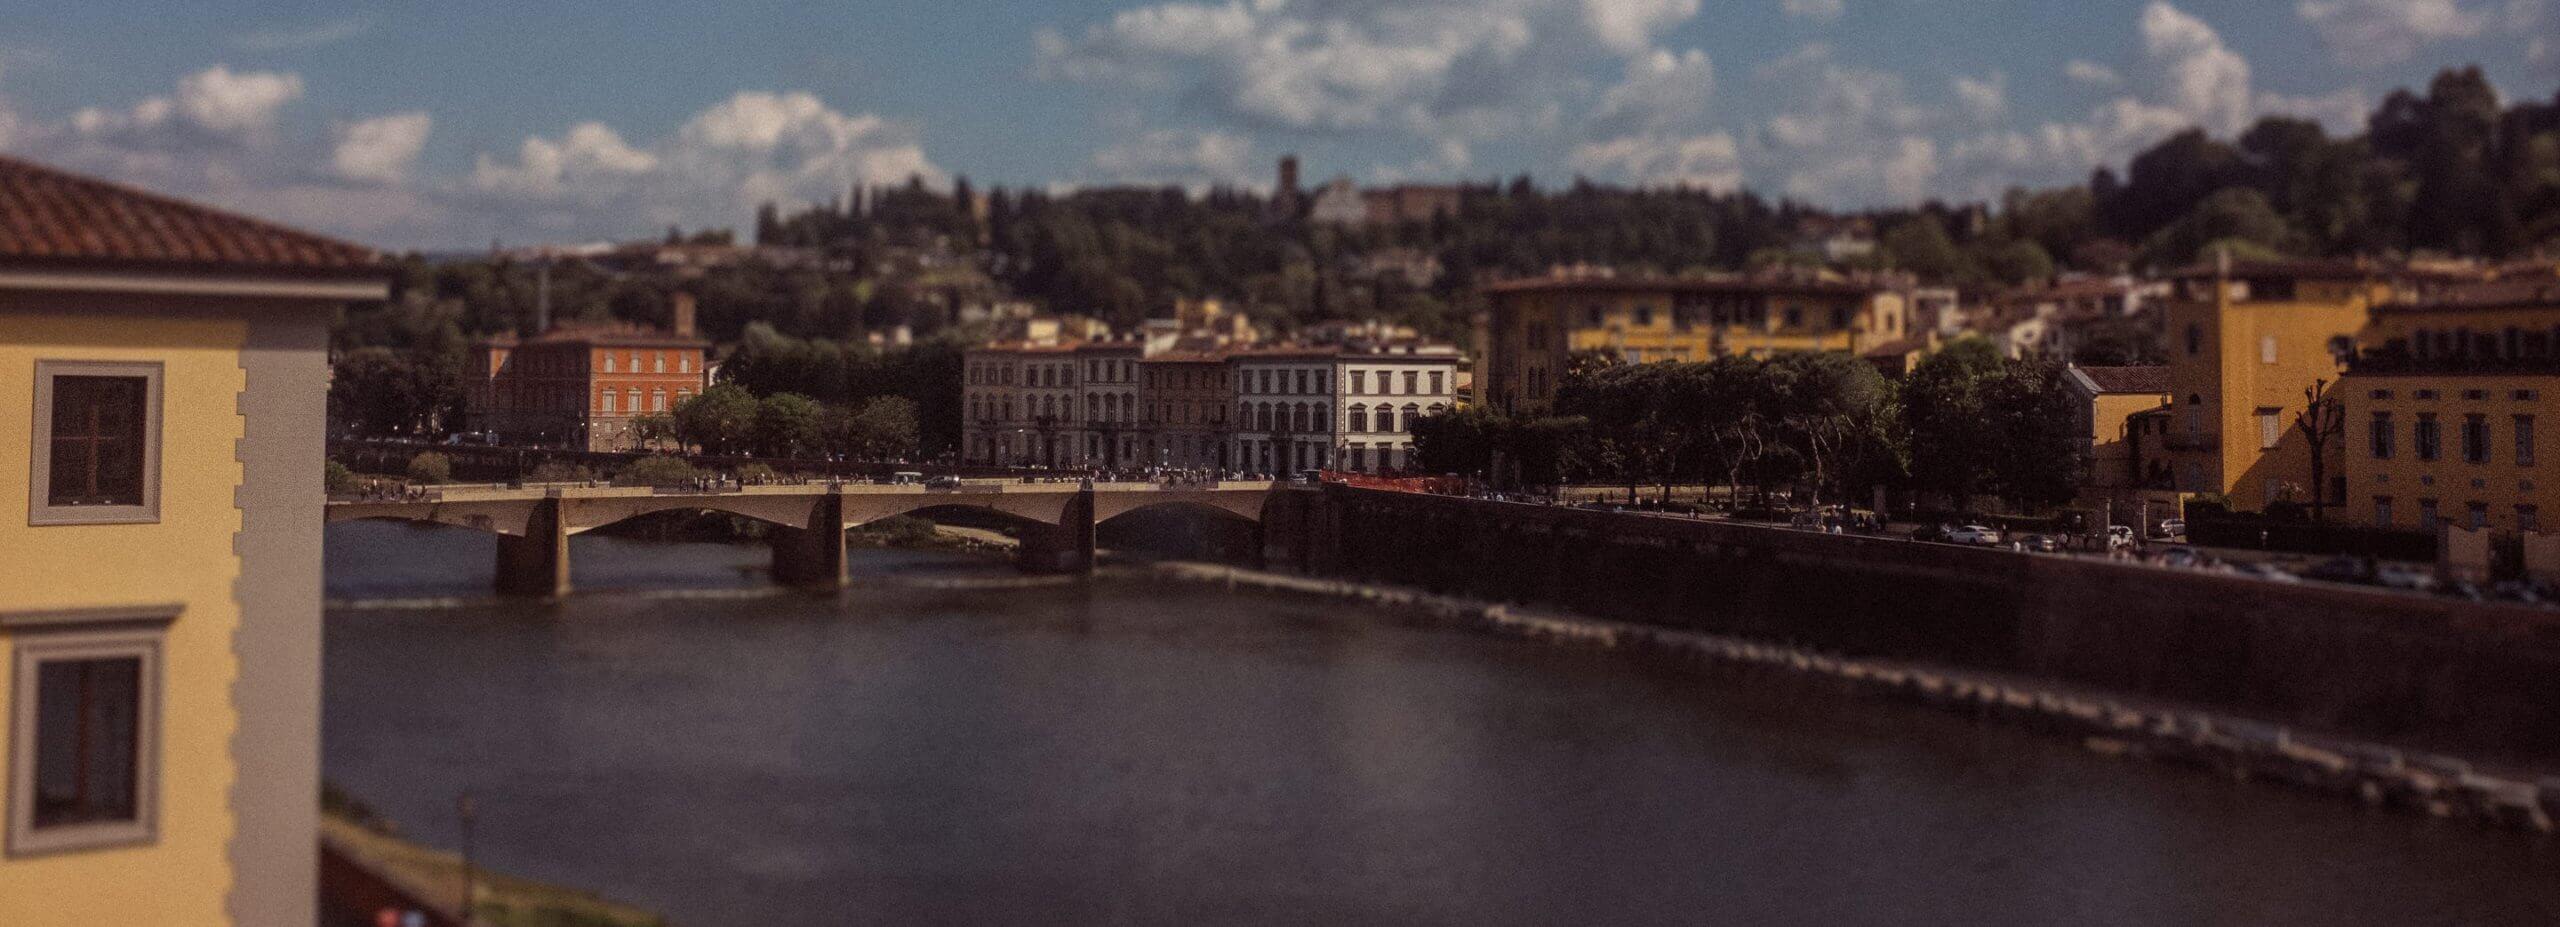 Travel-Florence-Photography-Johannes-Maur-3117